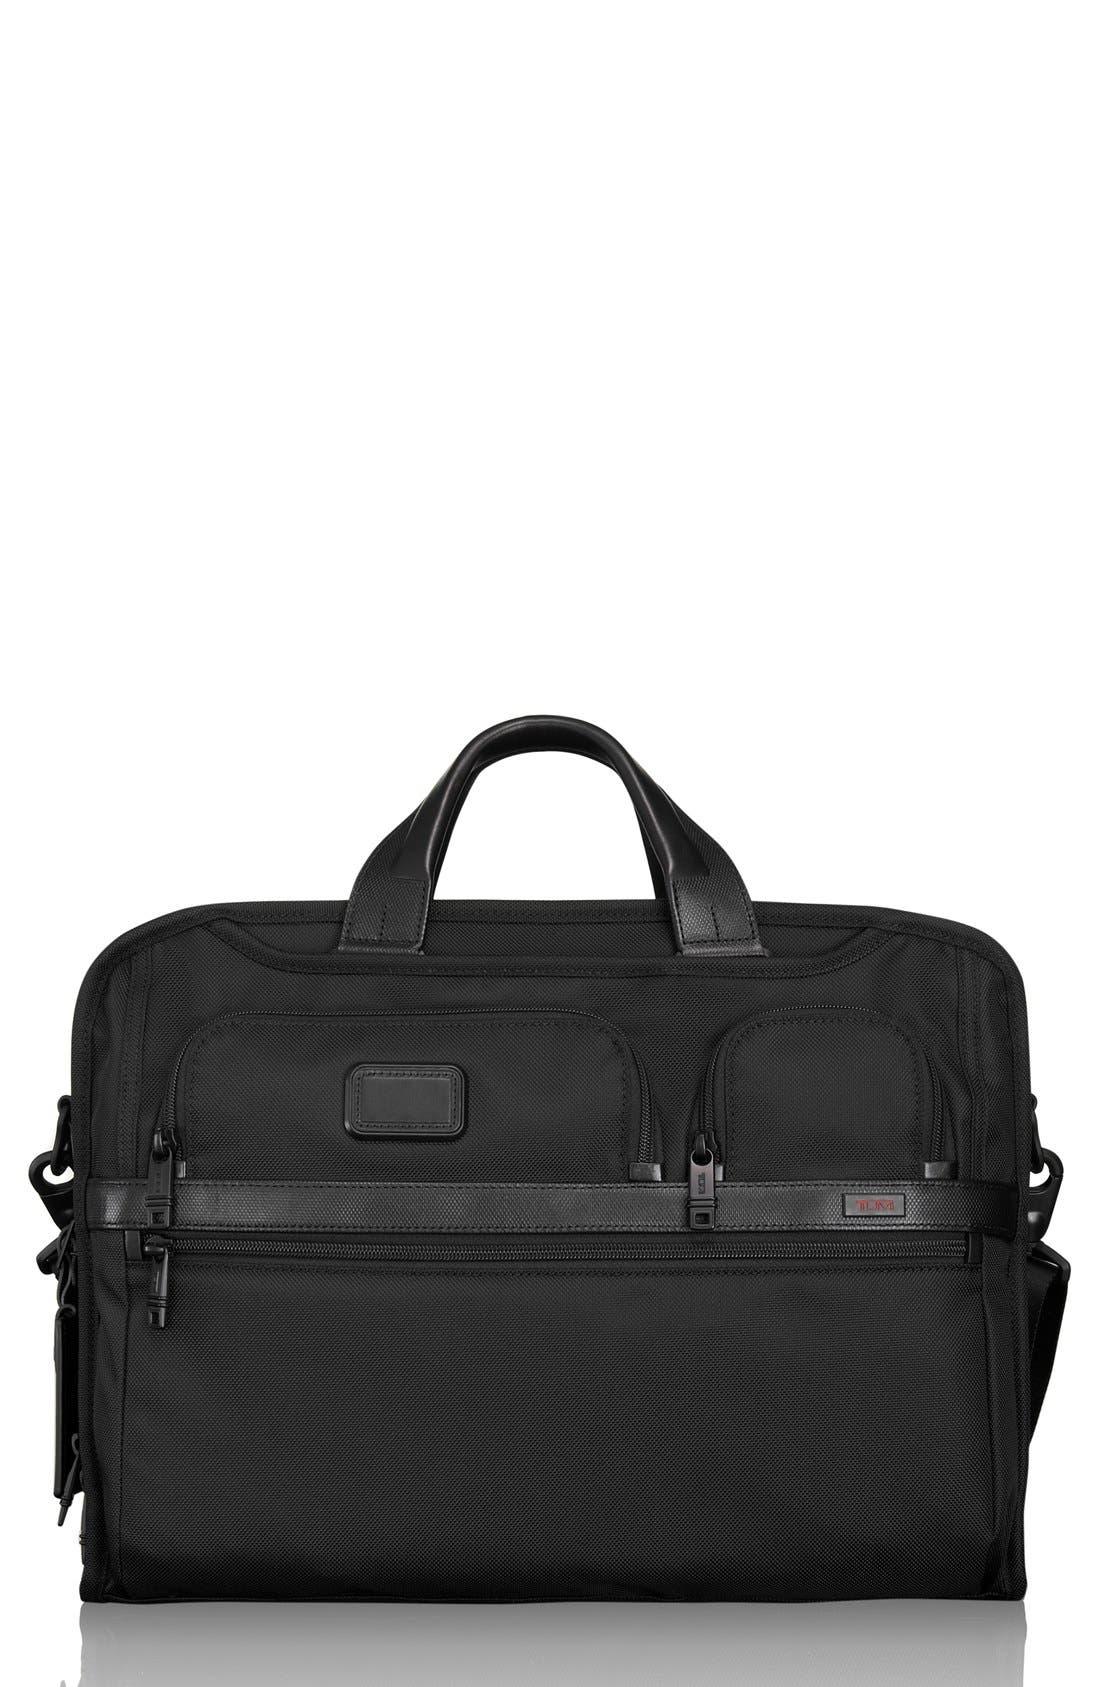 Main Image - Tumi 'Alpha 2' Laptop Briefcase with Tumi ID Lock Pocket